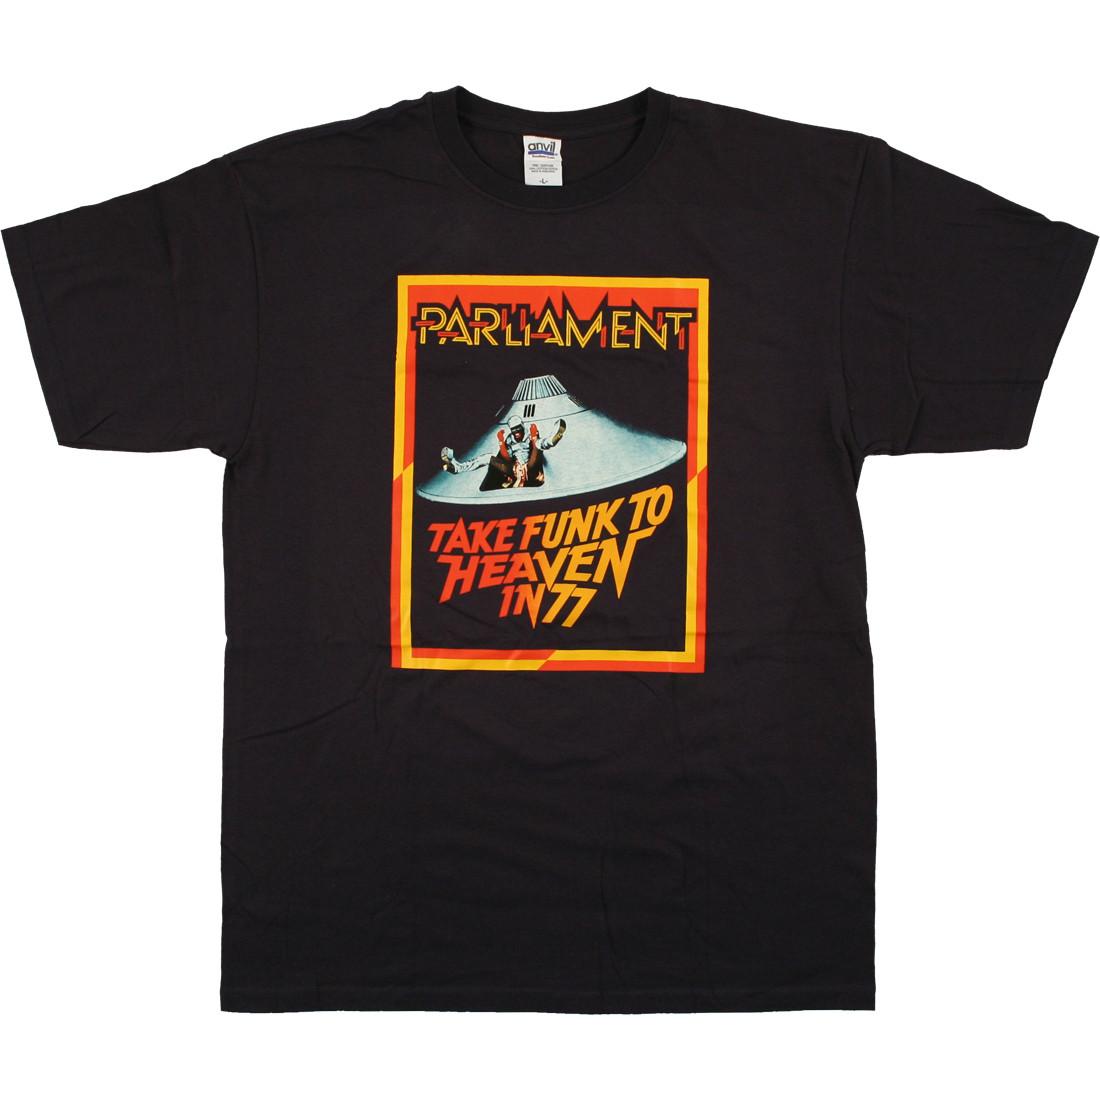 Parliament Funk To Heaven Navy T-Shirt